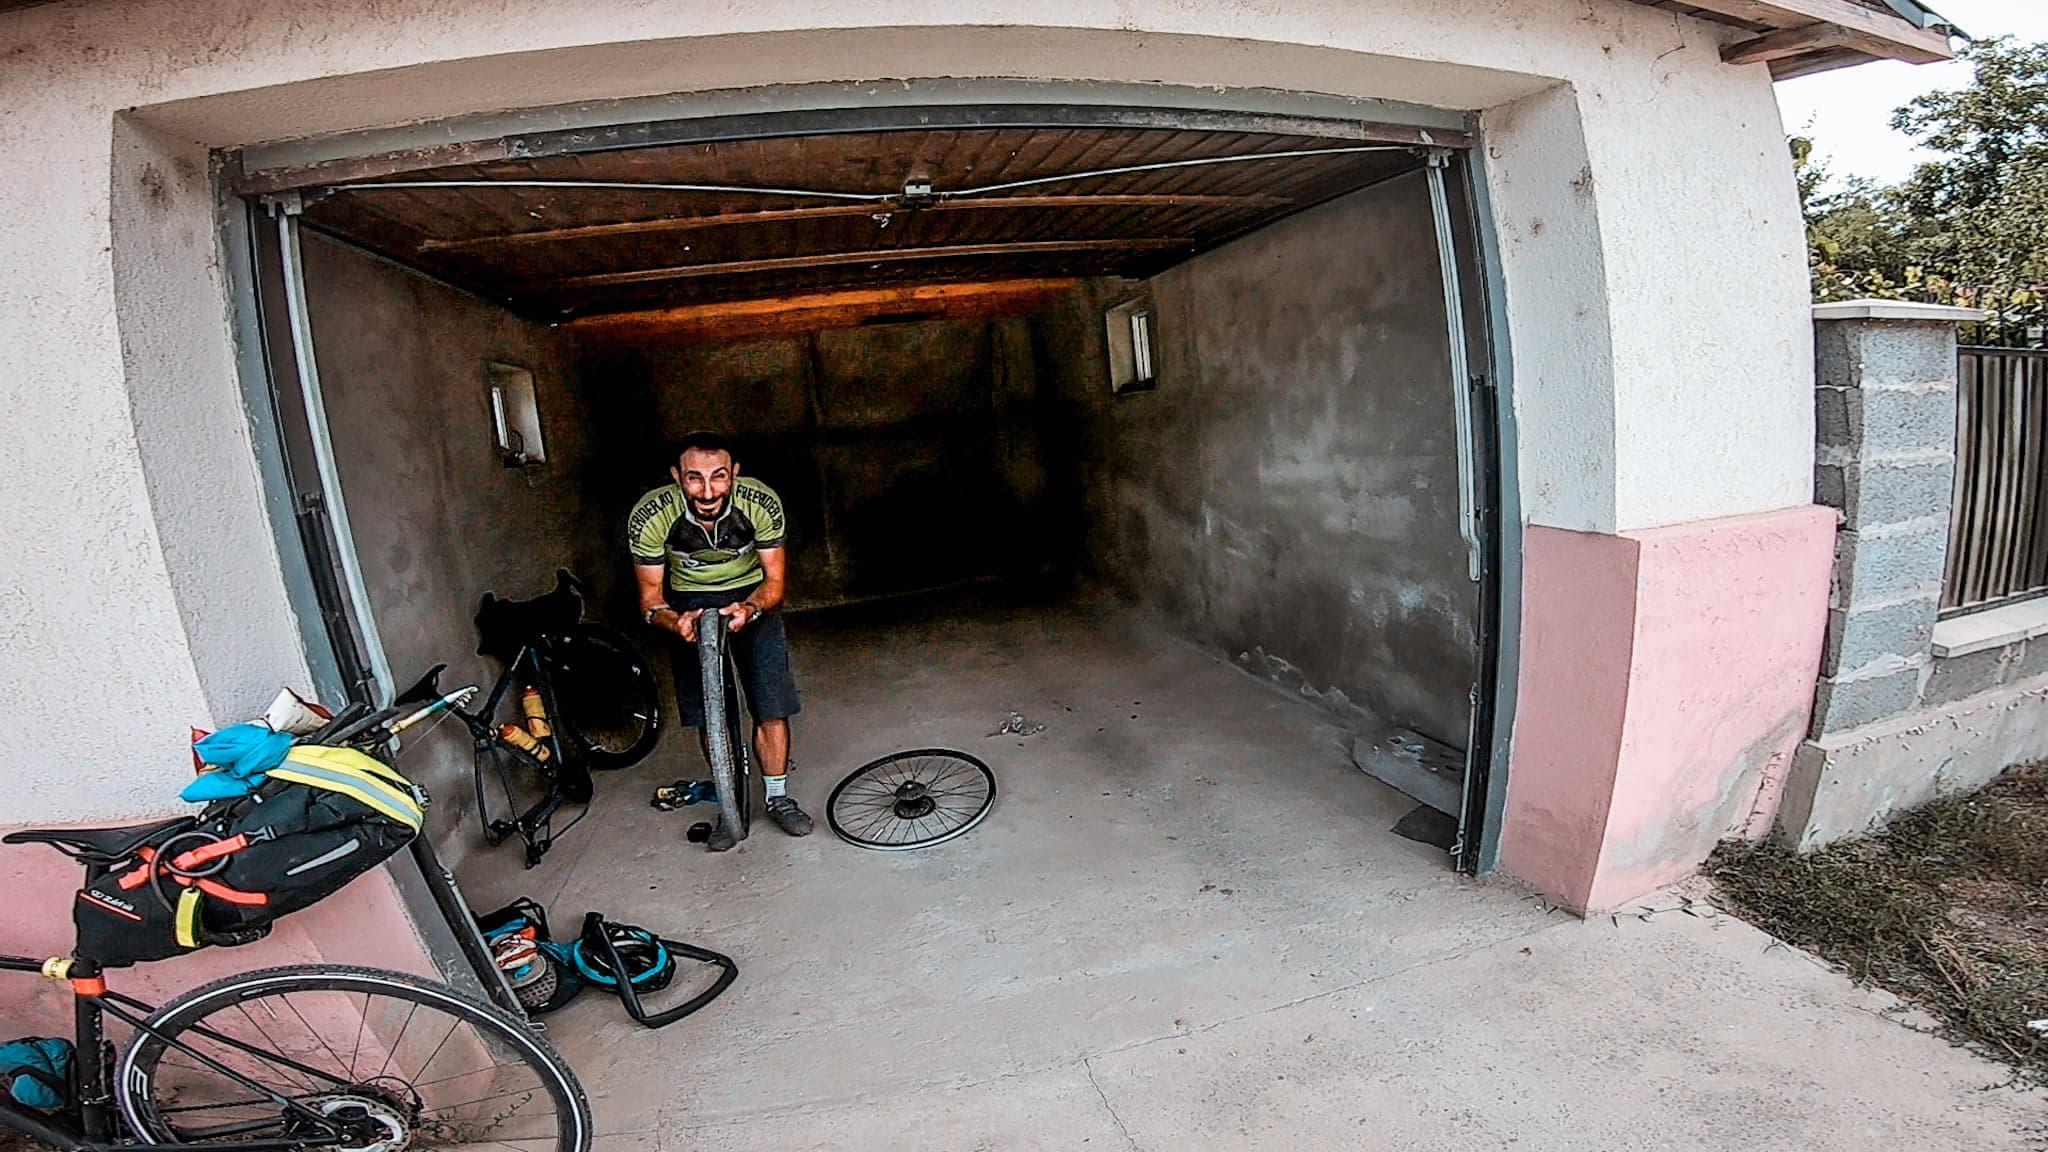 Reparand pana pe tura de bikepacking spre Vama